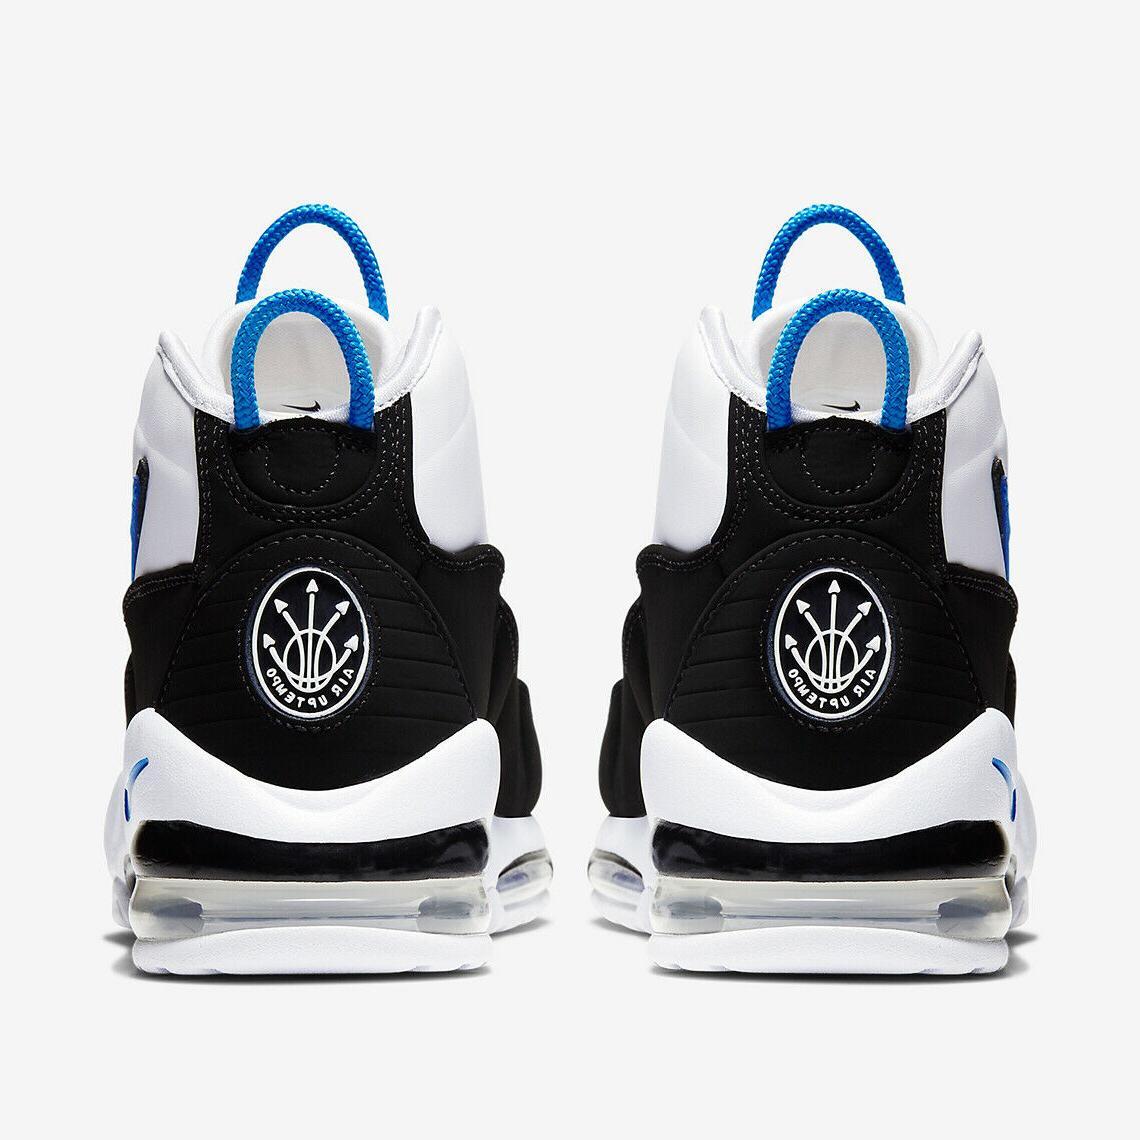 Nike Uptempo '95 Blue CK0892-103 NEW